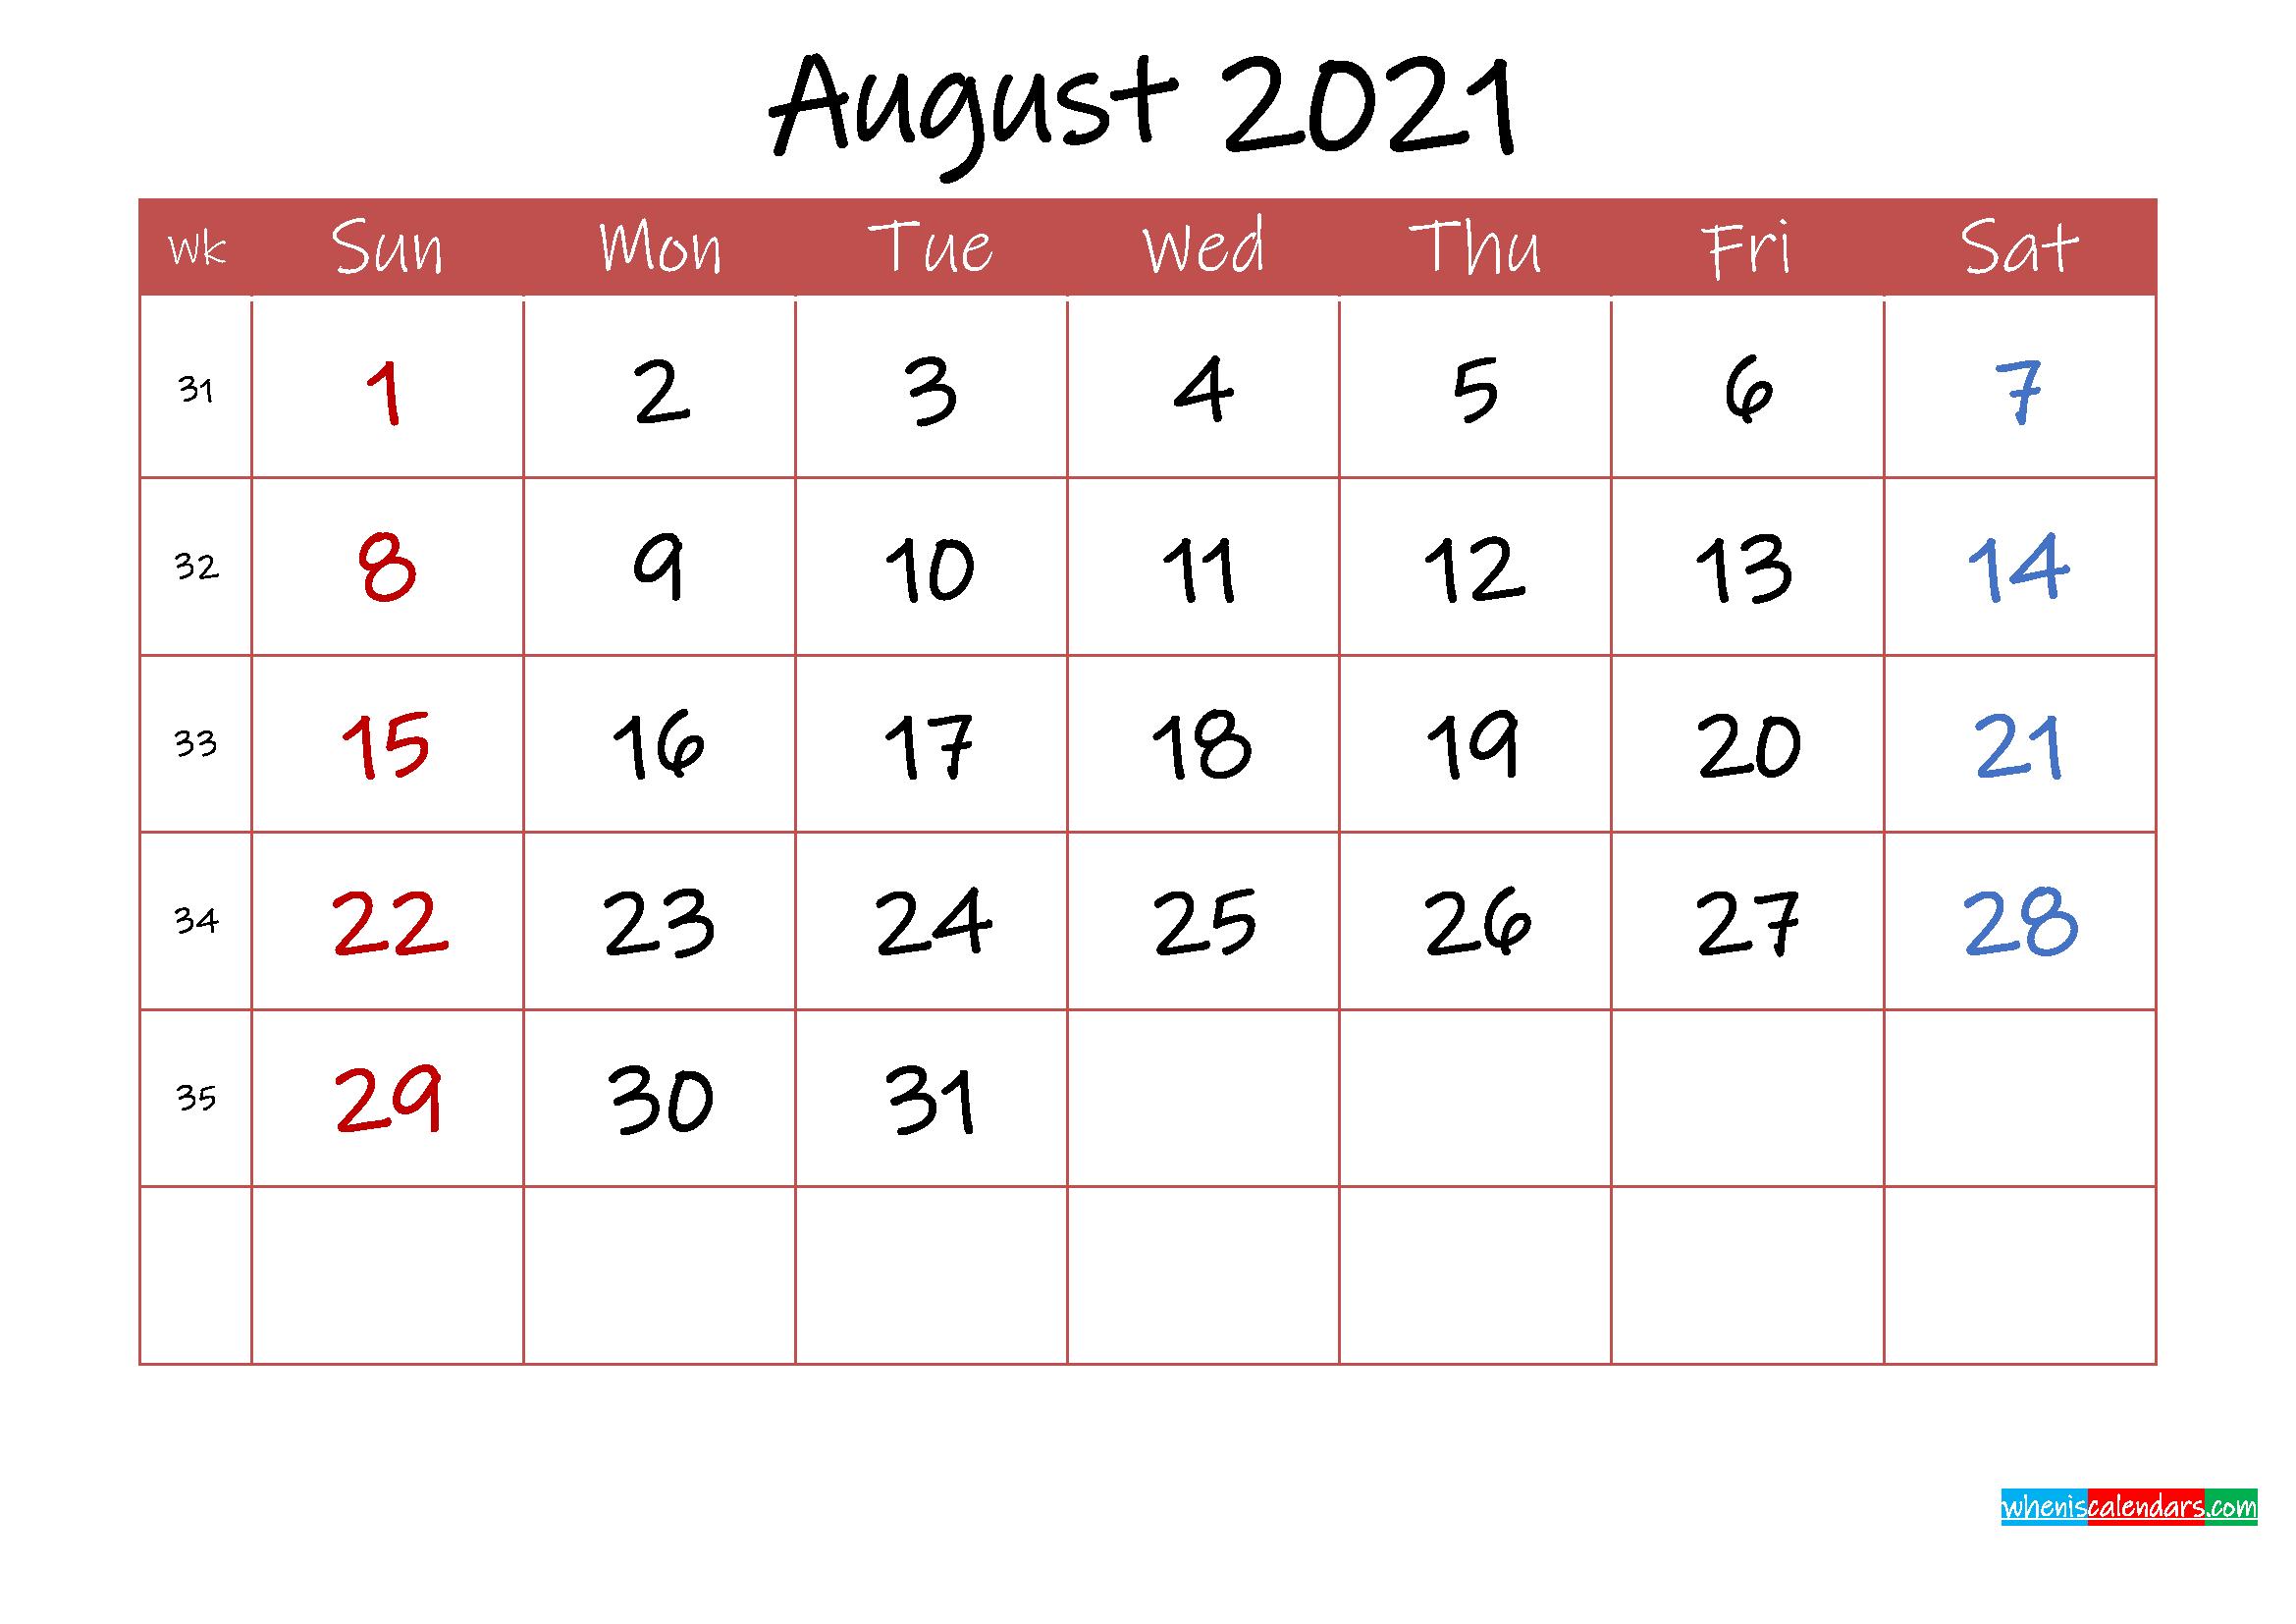 Printable August 2021 Calendar With Holidays  Template inside August 2021 Calendar Print